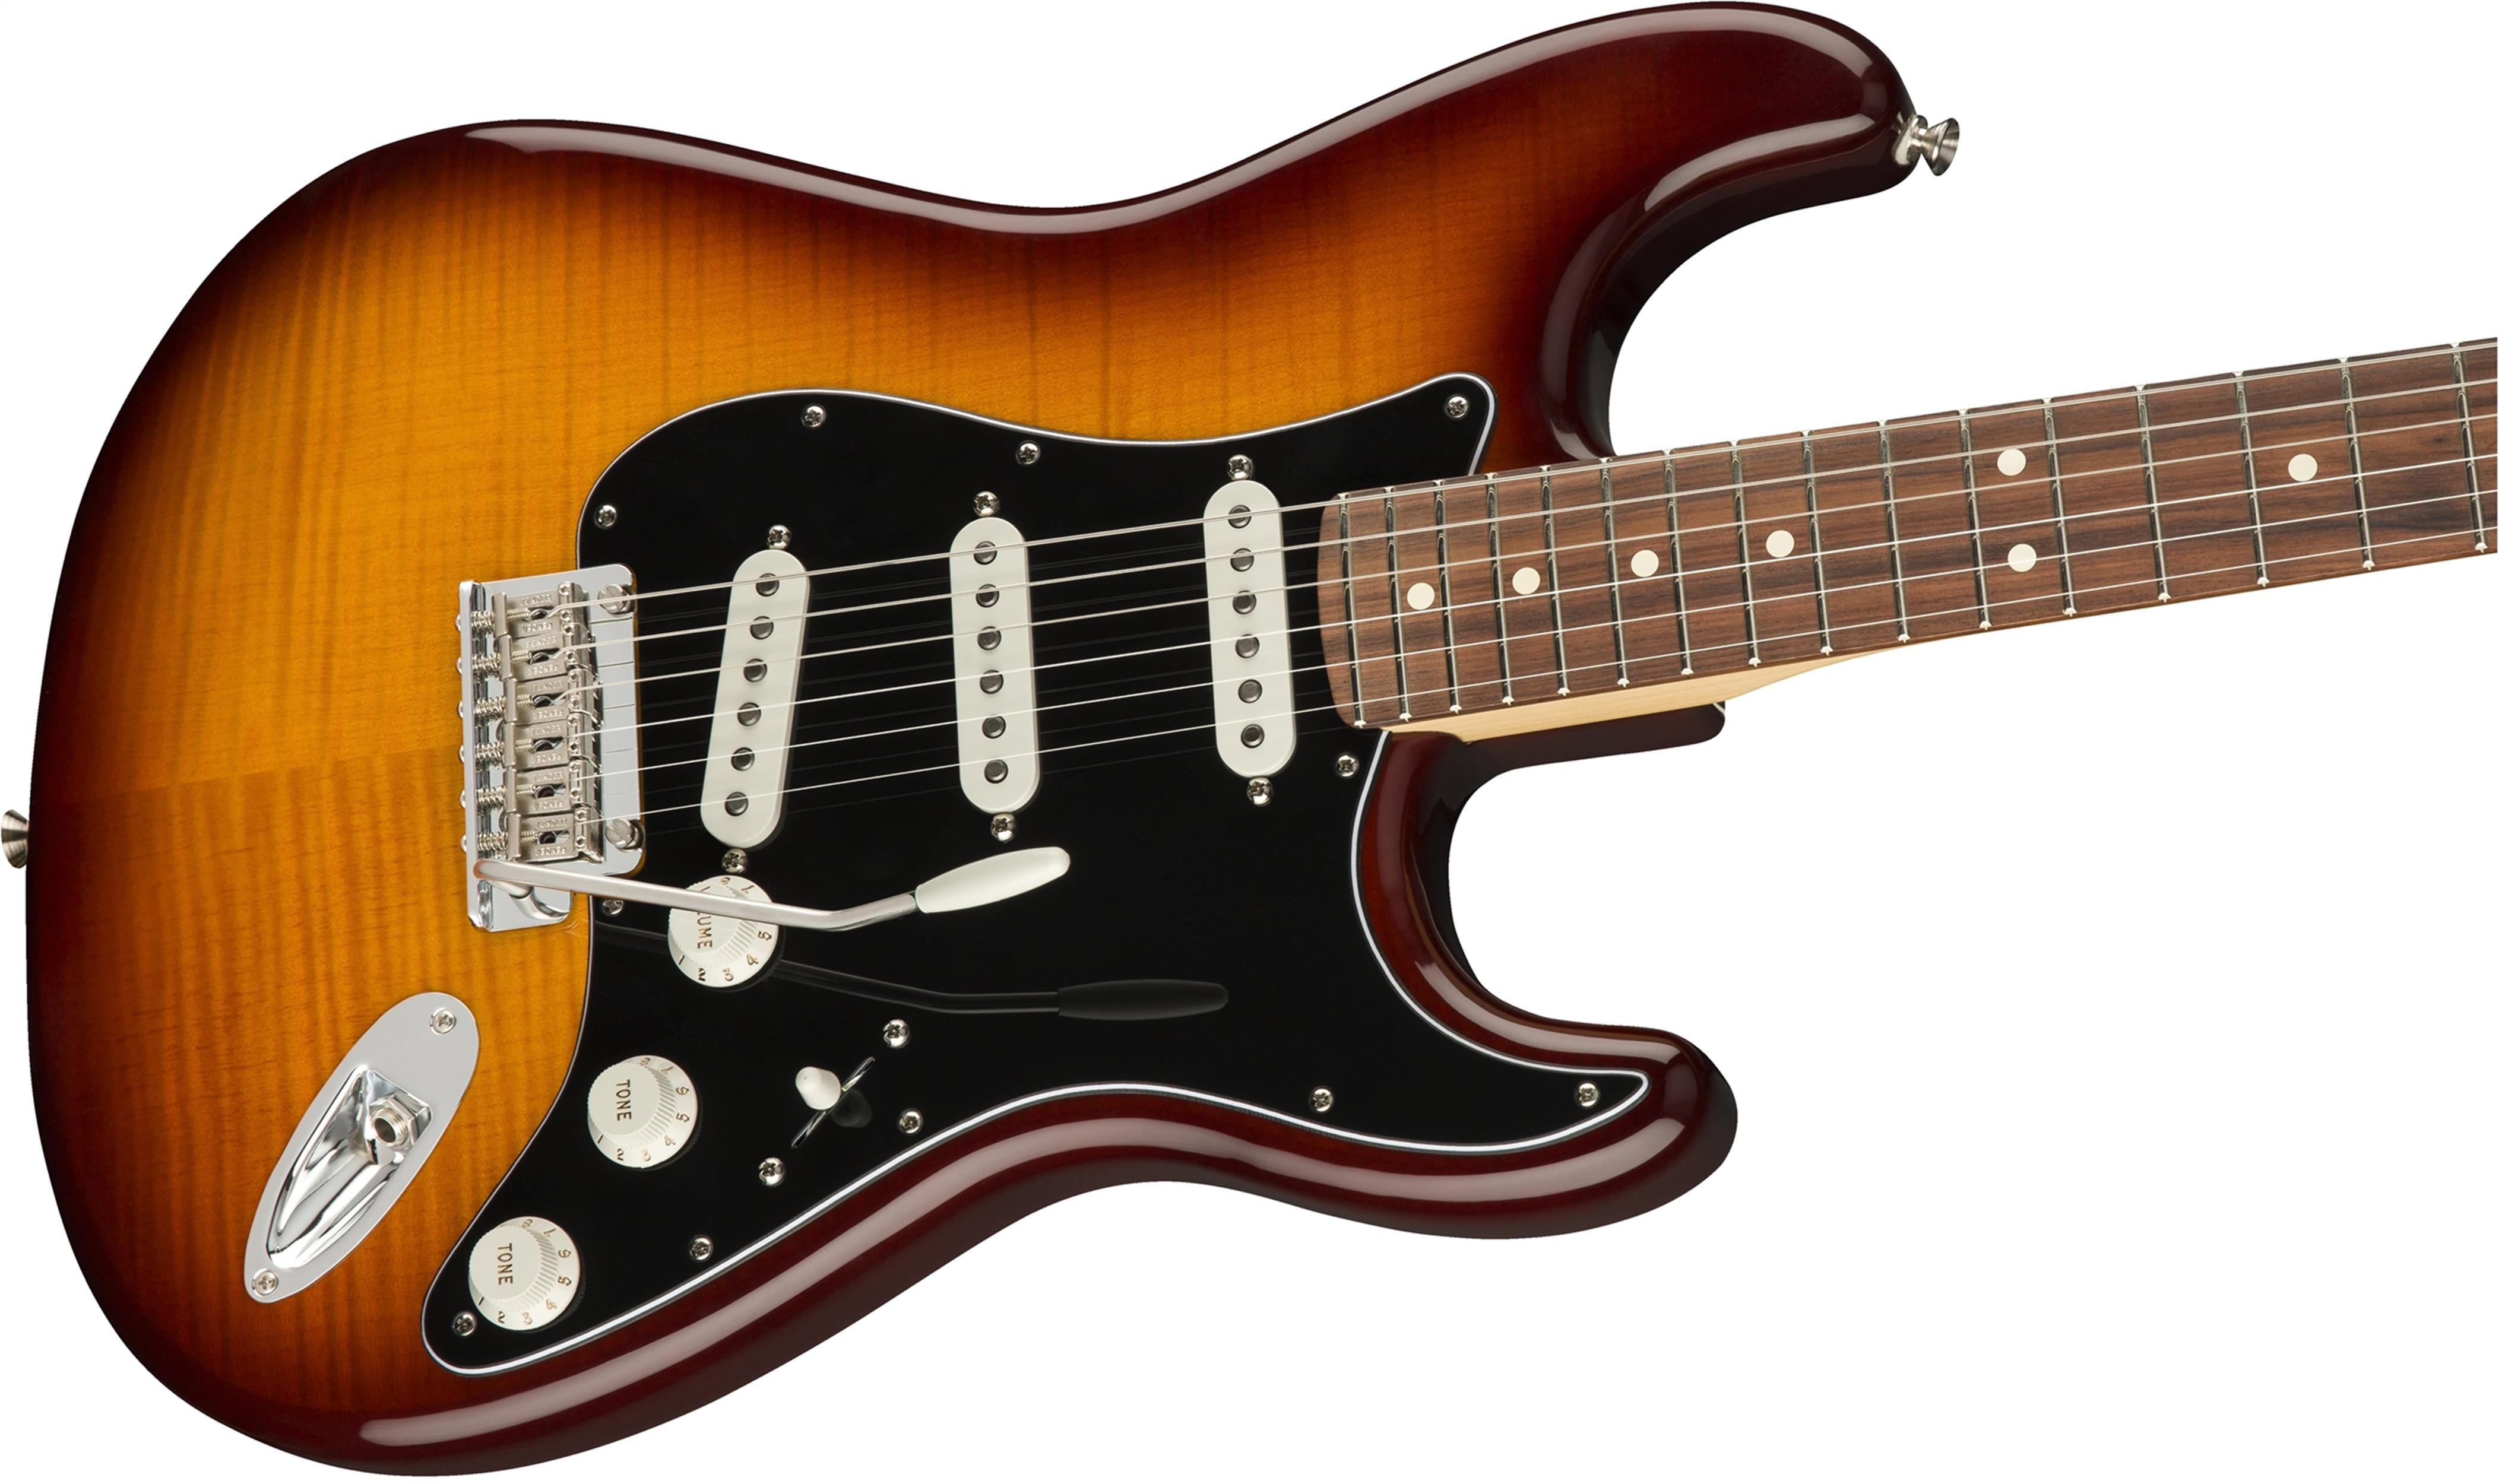 FENDER-Player-Stratocaster-Plus-Top-Pau-Ferro-Fingerboard-Tobacco-Sunburst-0144553552-sku-20826